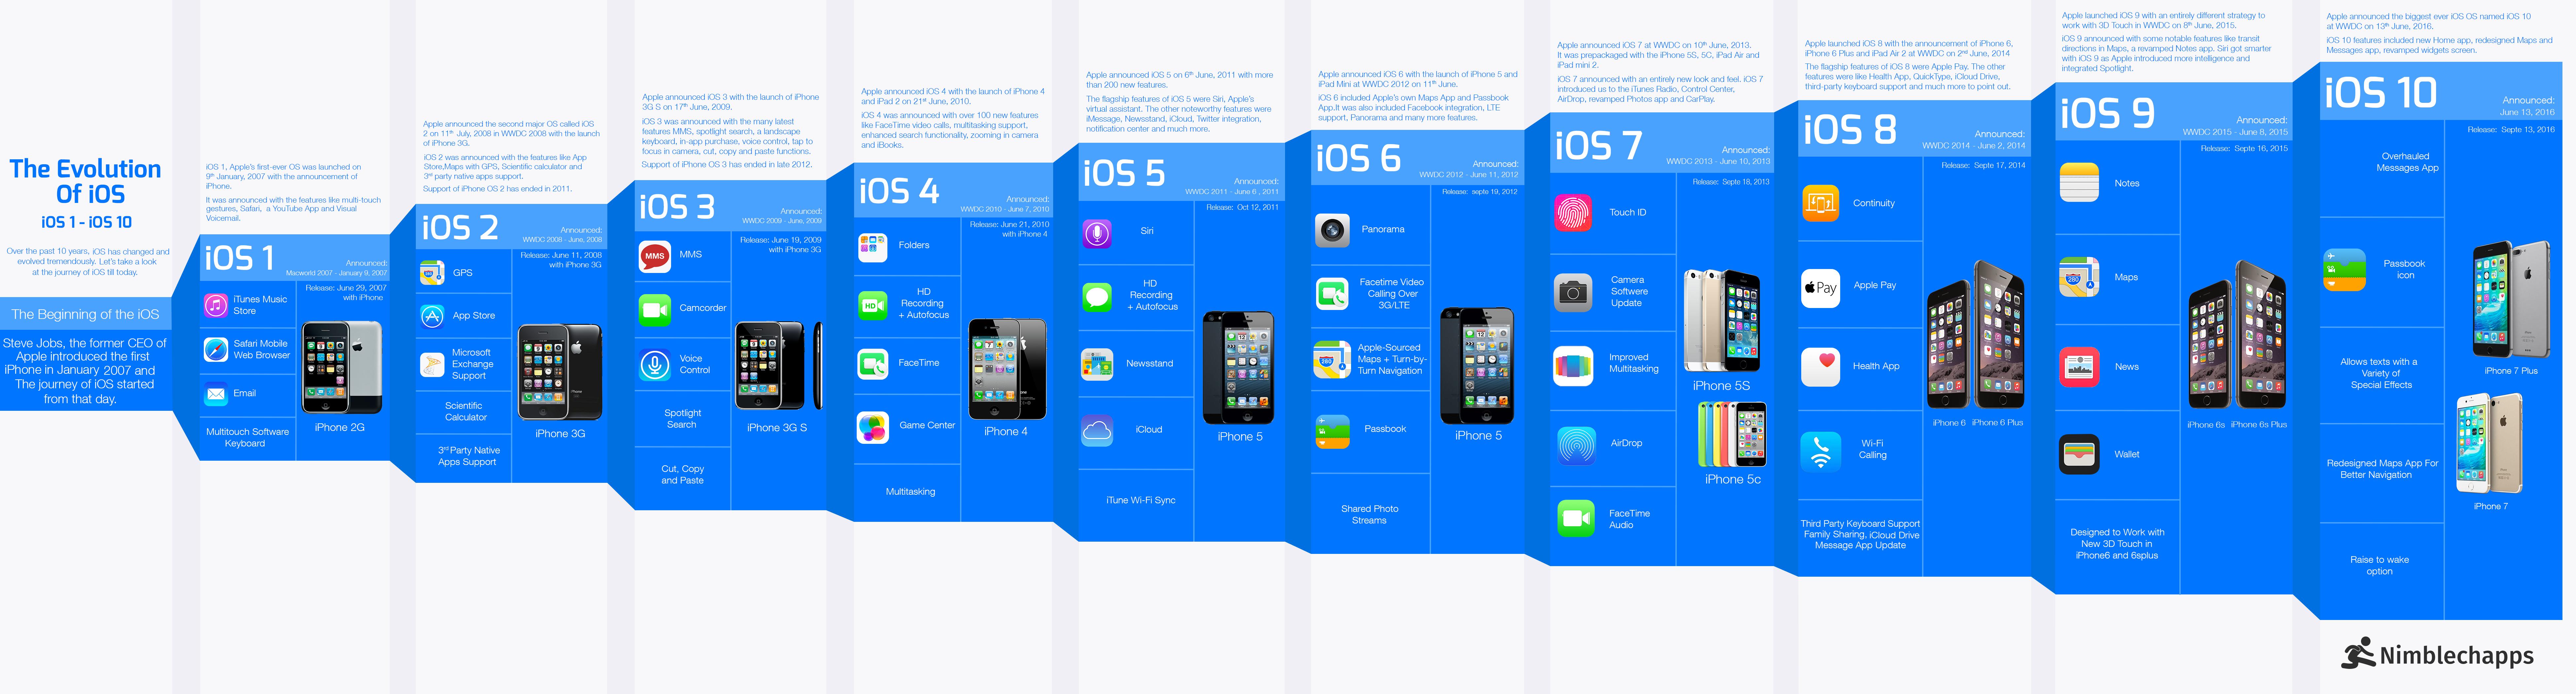 The Evolution Of Ios Infographic Techno Faq